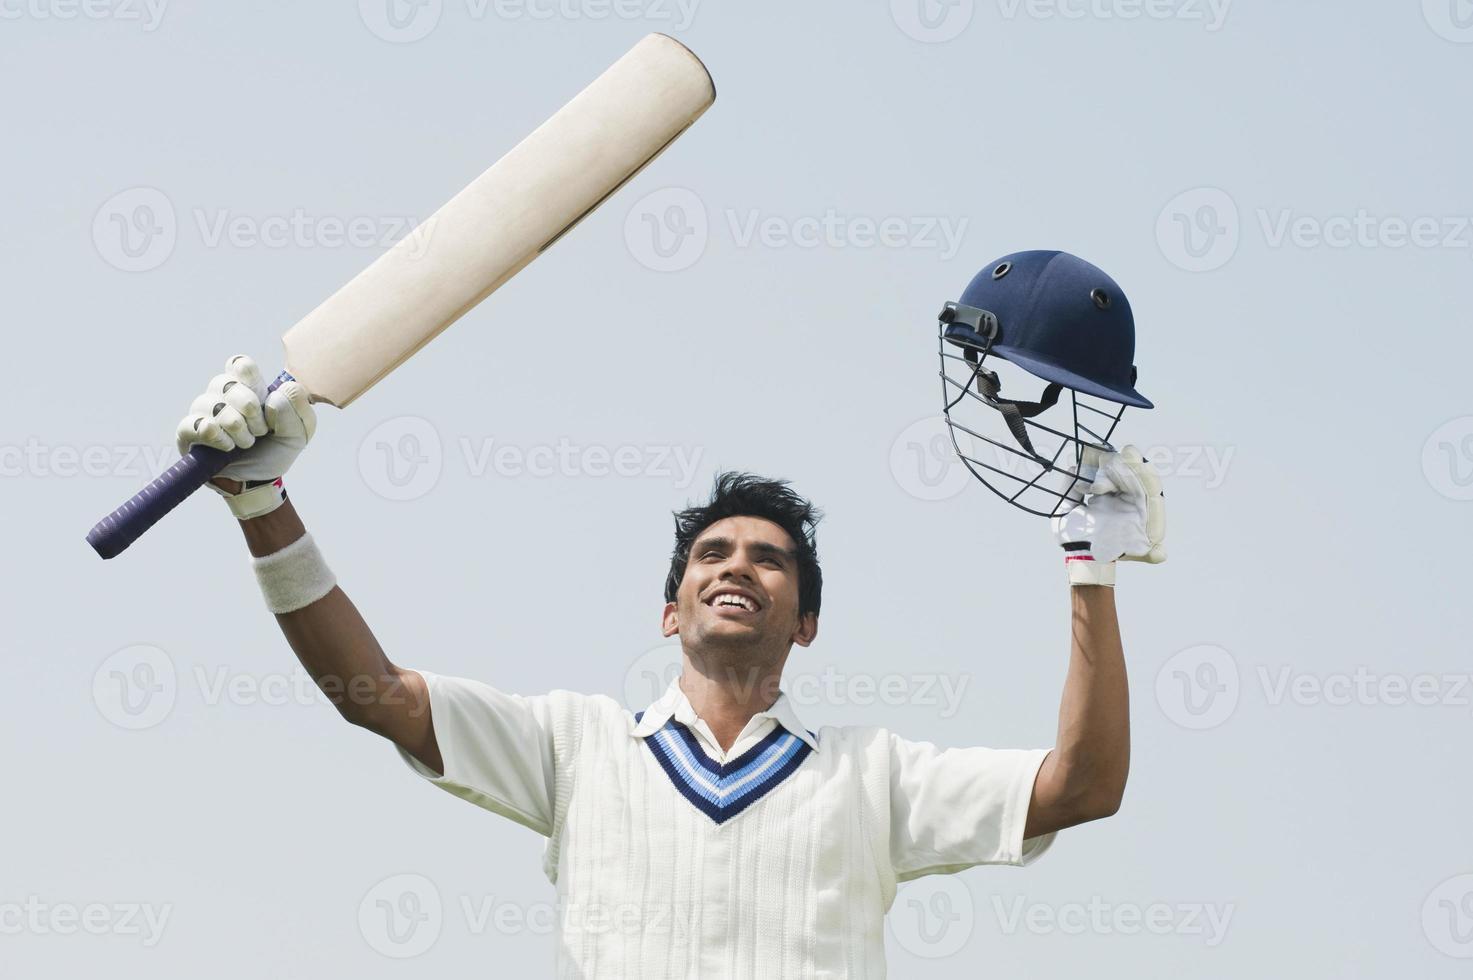 Cricket-Schlagmann feiert seinen Erfolg foto